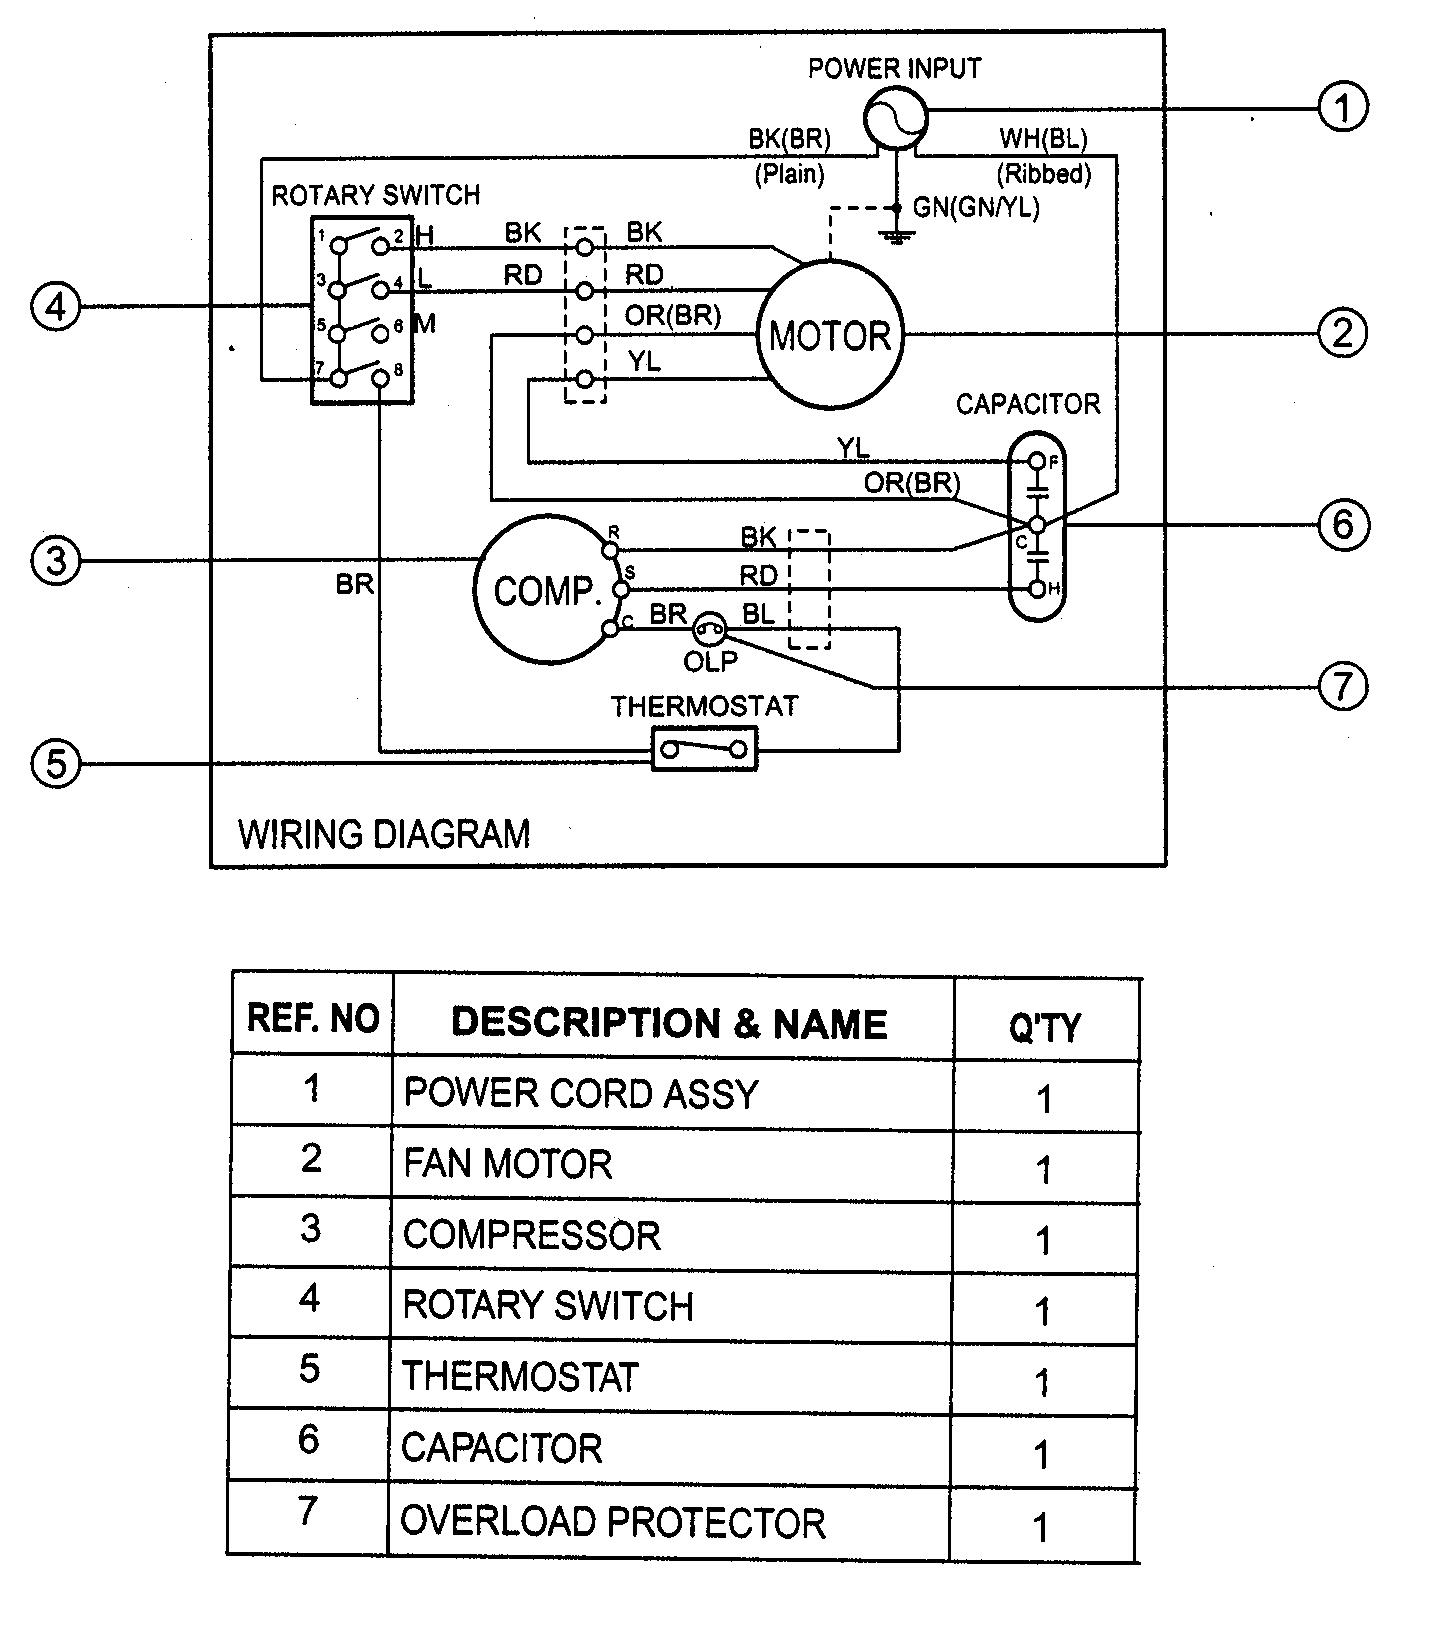 50021807 00002?resize\=665%2C756 2003 dutchmen dometic rv thermostat wiring diagram,dometic VacuFlush Marine Toilet Repair at bakdesigns.co